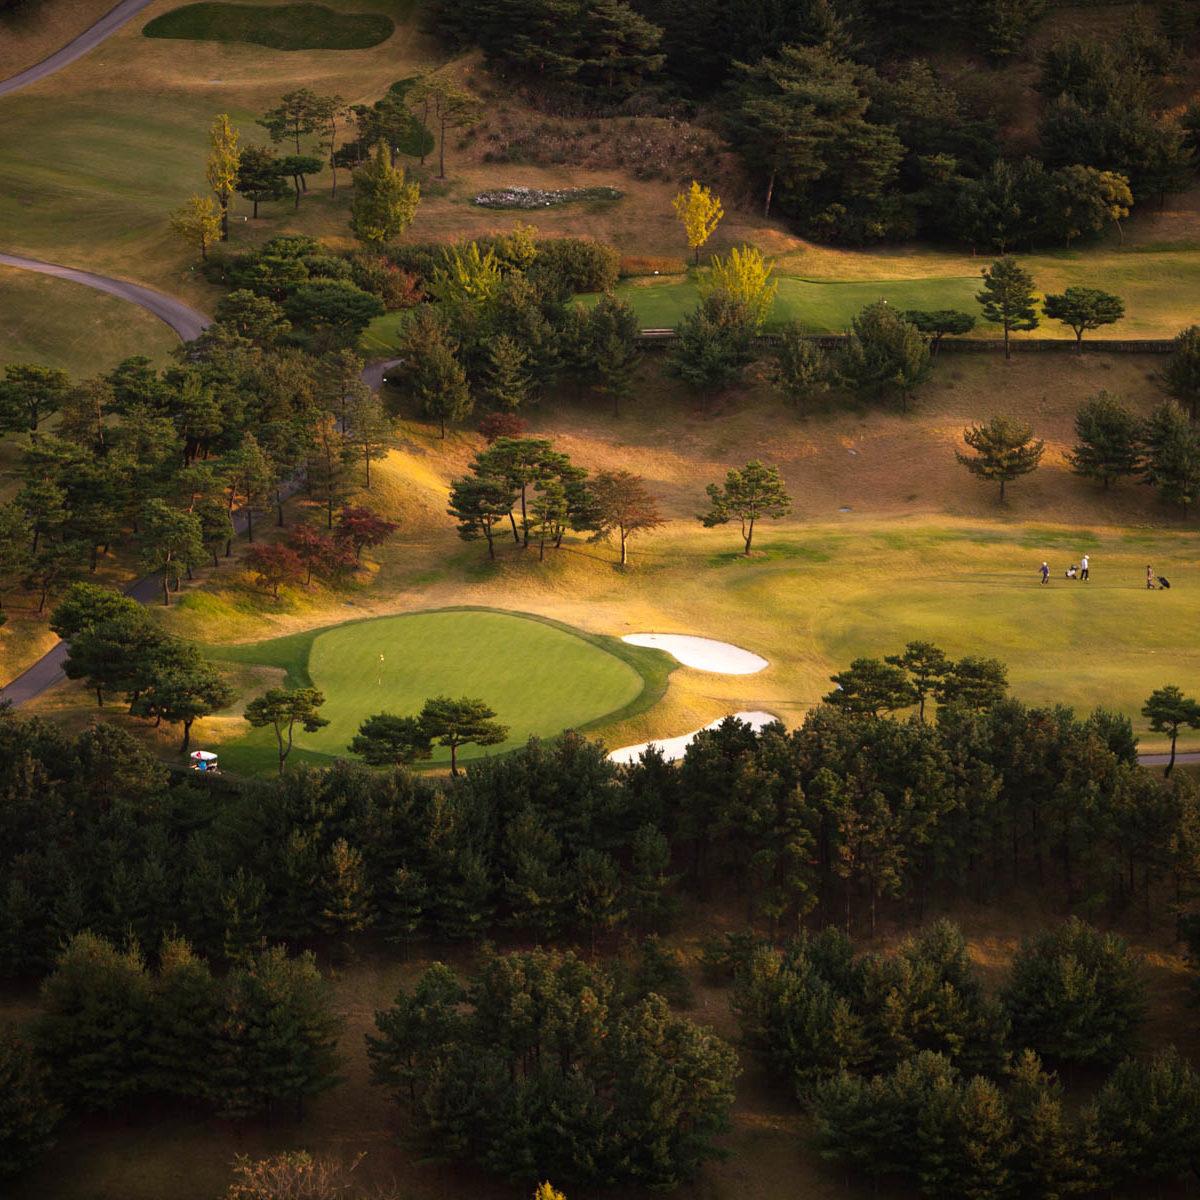 Gyeonggi - golf du Taeyoung country club, près de Yongin - Corée Du Sud – Asie (37°07' N - 127°18' E)